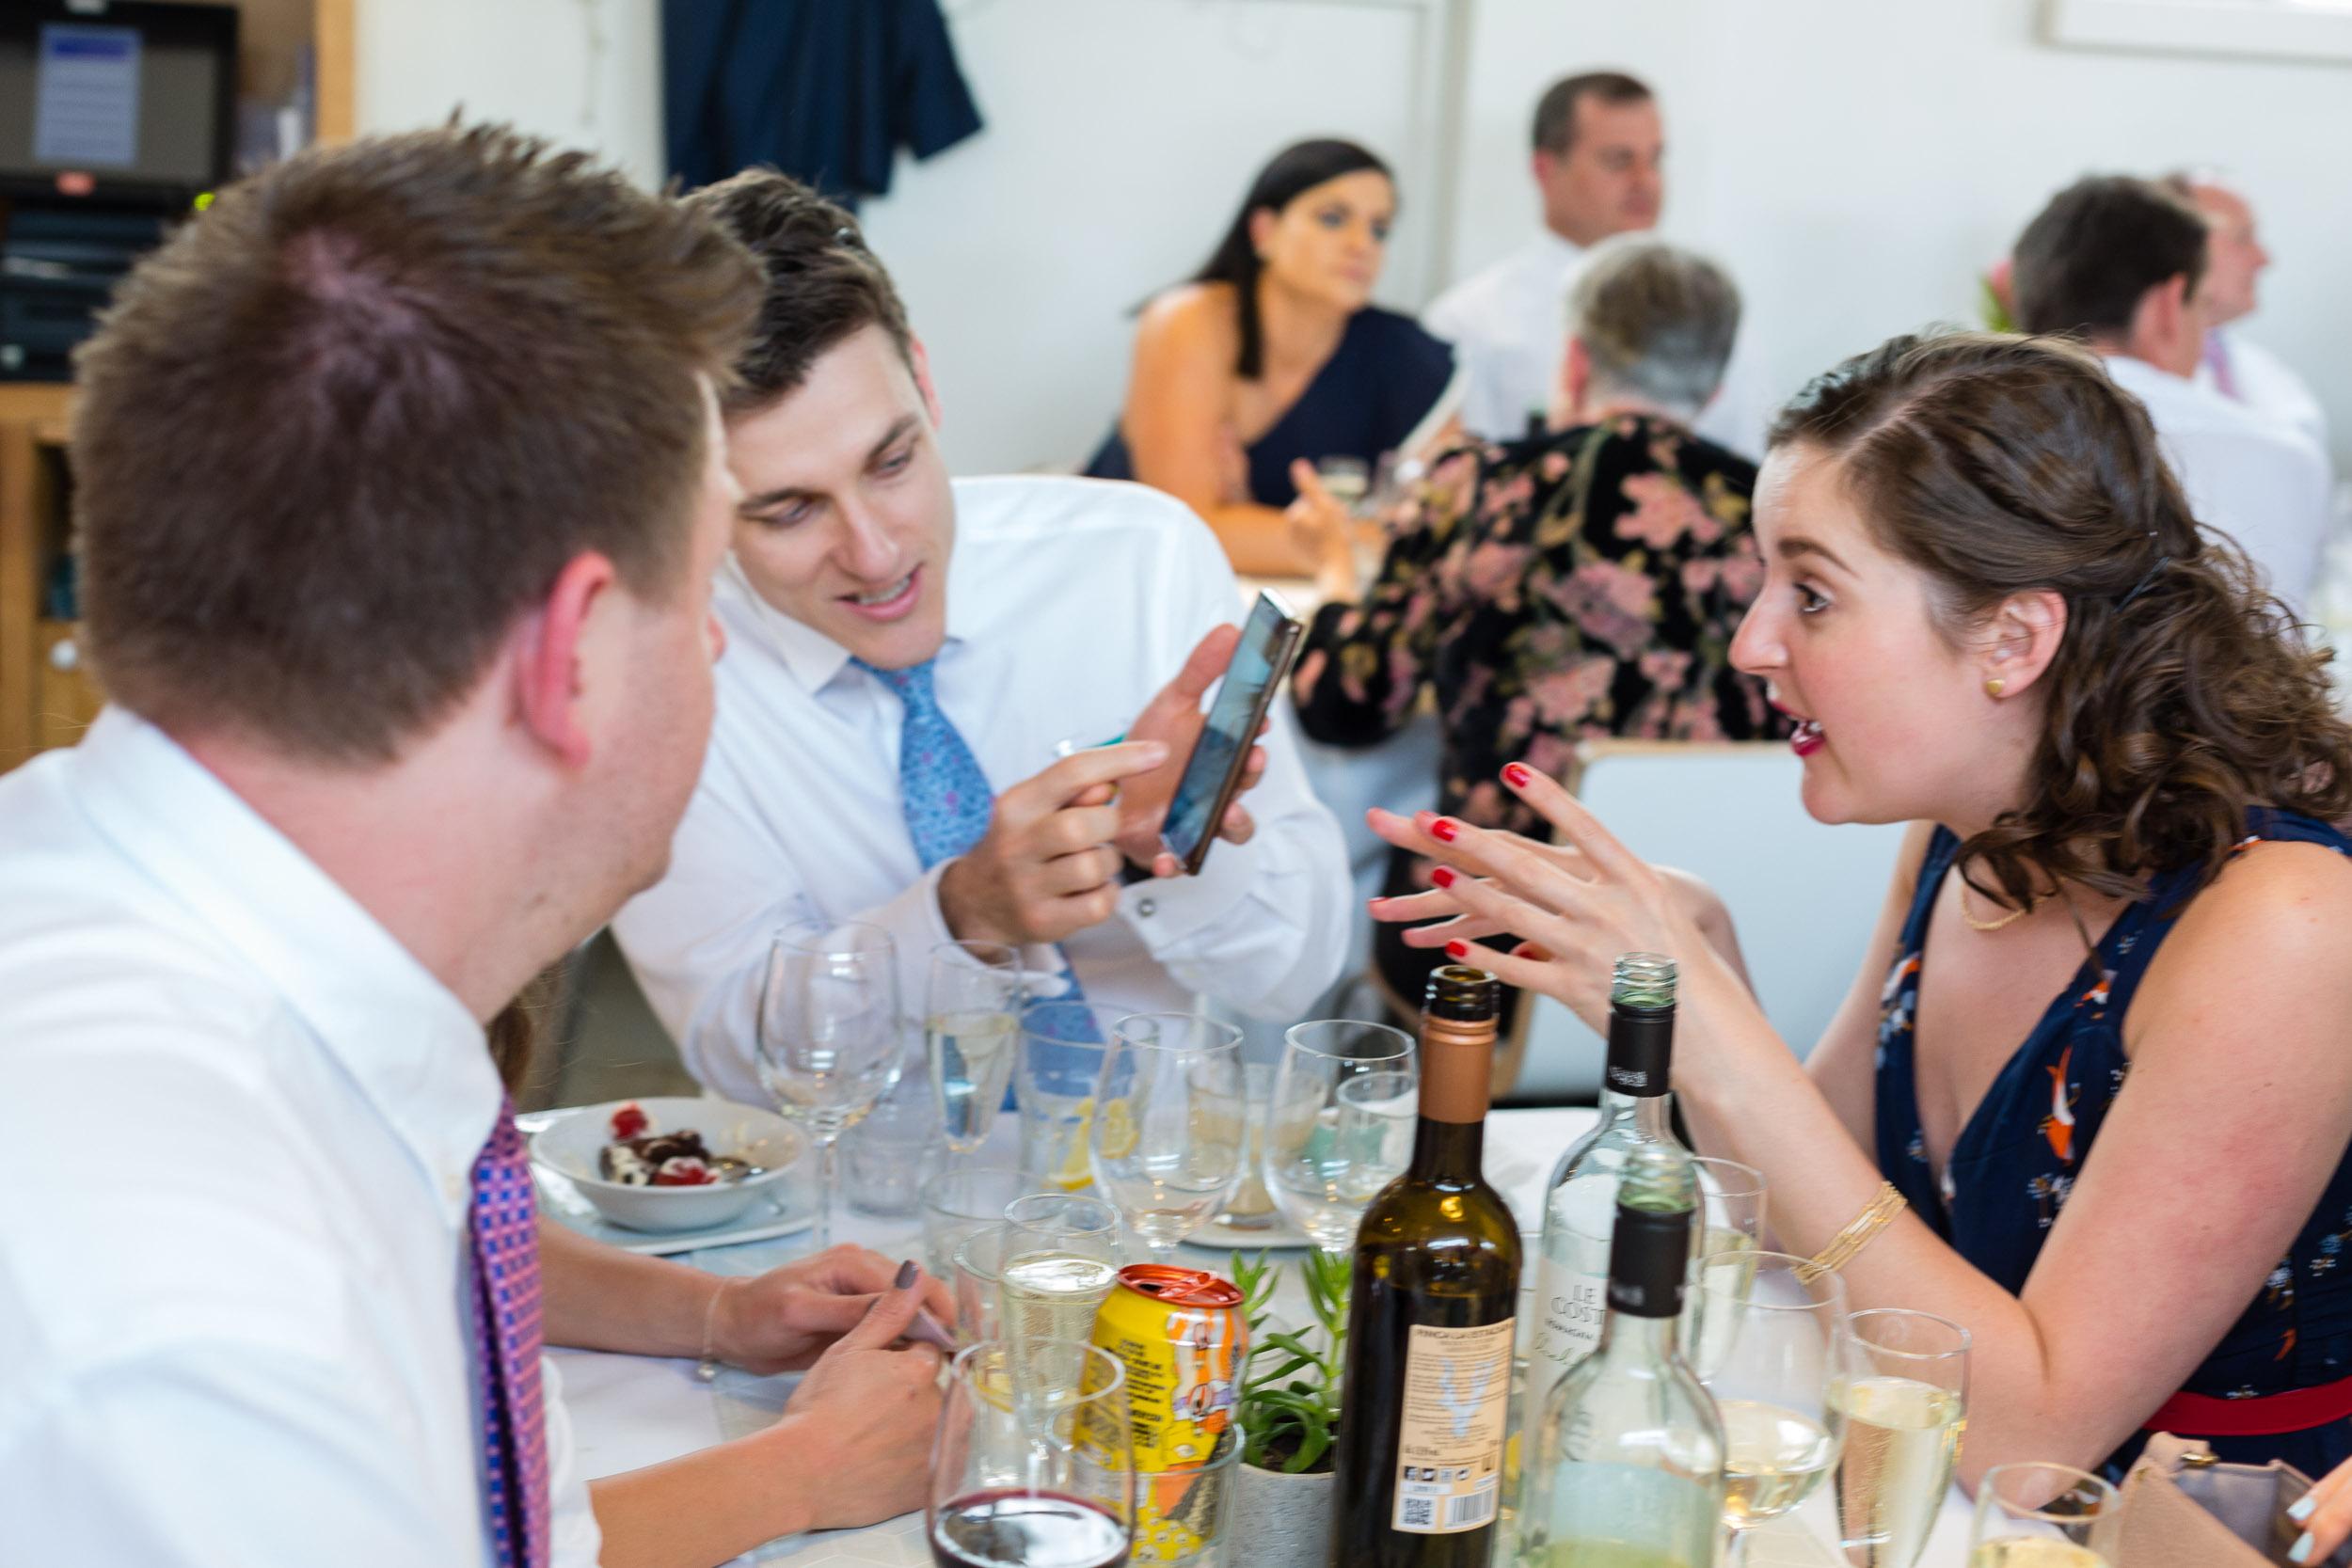 brockwell-lido-brixton-herne-hill-wedding-318.jpg